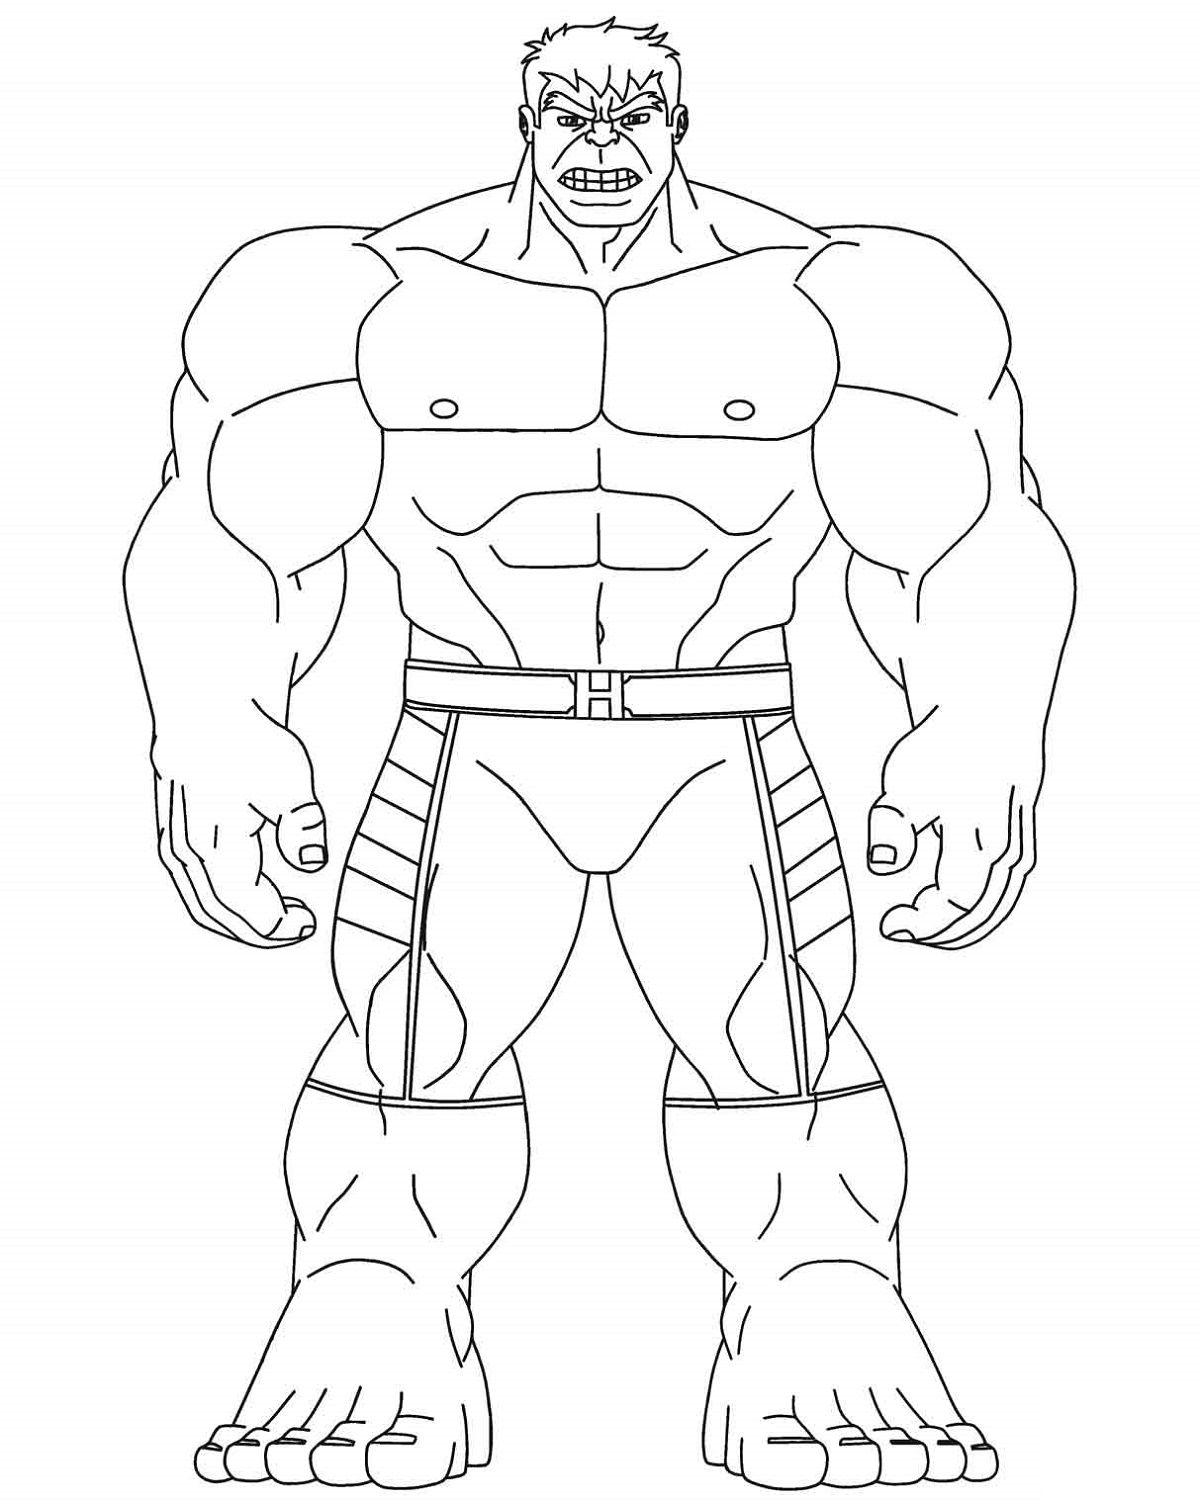 Hulk Coloring Pages Free  Printable Shelter in 9  Hulk